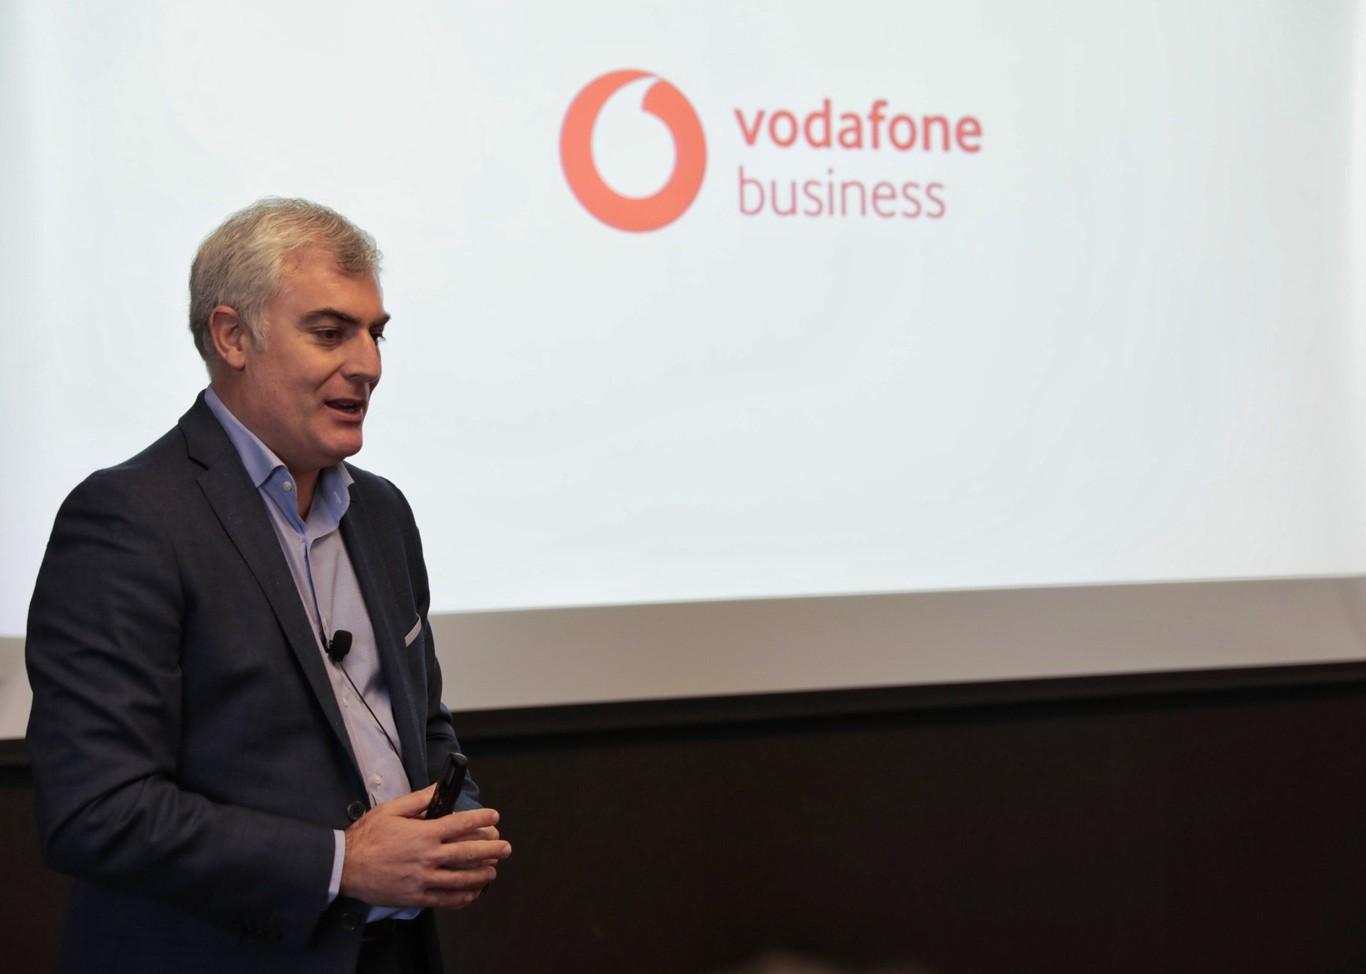 Vodafone presume de liderar IoT en 2018 88fa6db74bc03